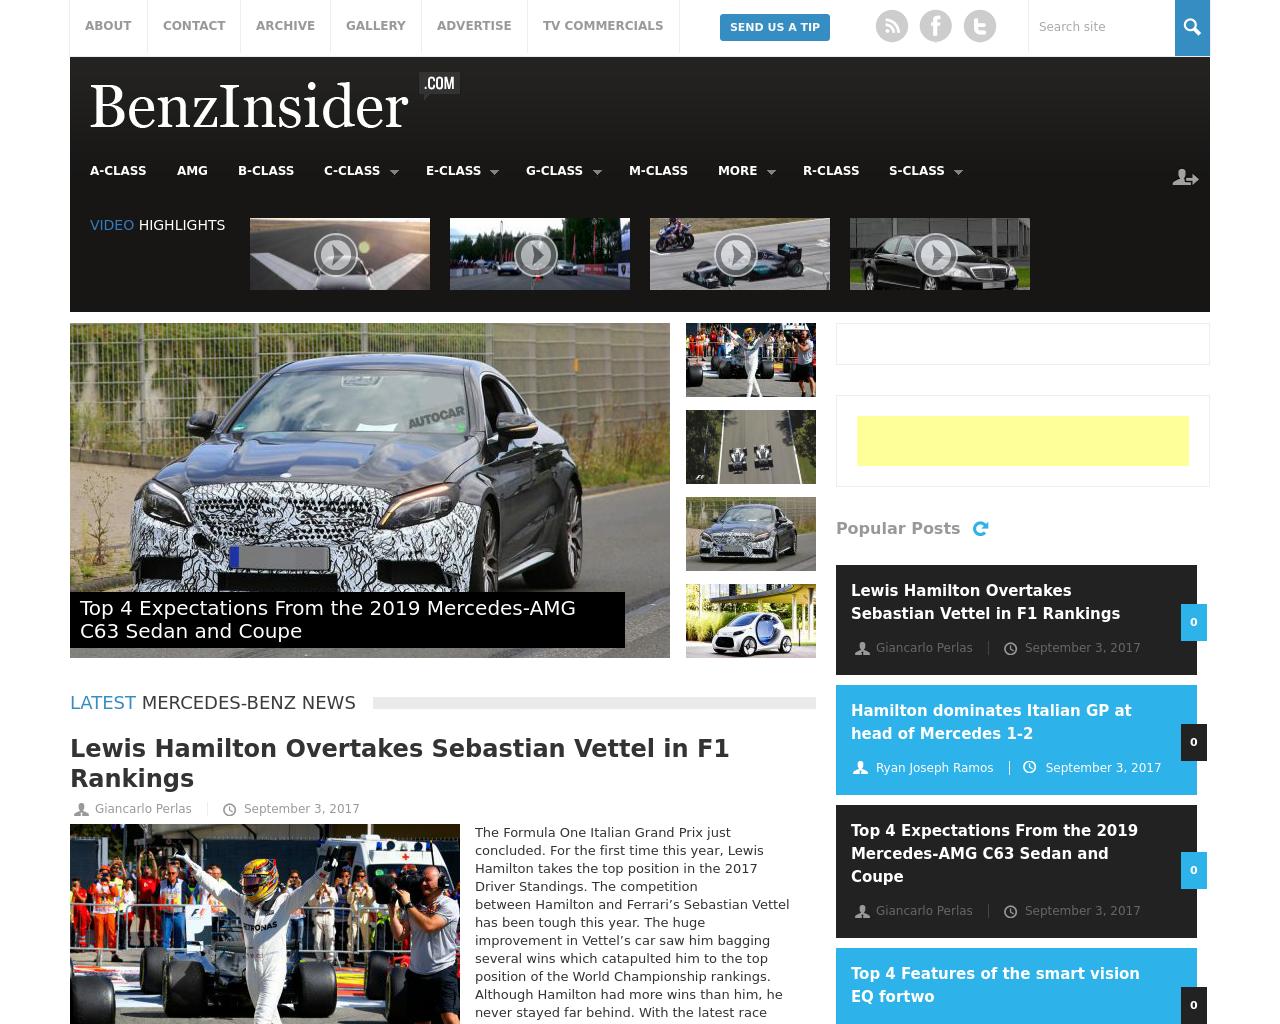 BenzInsider-Advertising-Reviews-Pricing